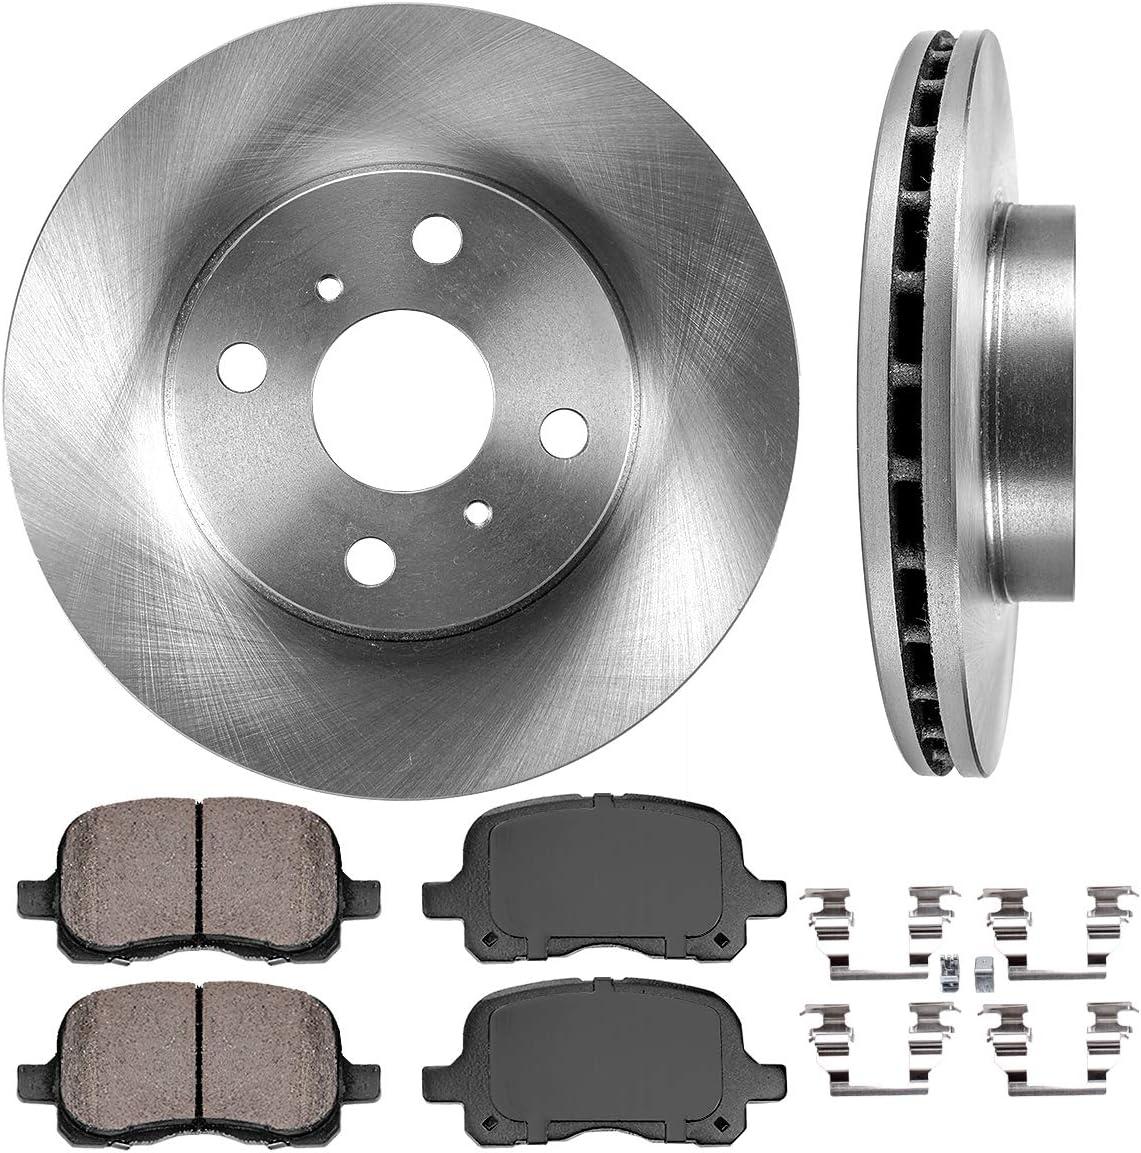 Ranking TOP12 CRK11124 FRONT 255 mm Premium OE 4 Rotors Brake Disc Lug 2 Max 46% OFF +